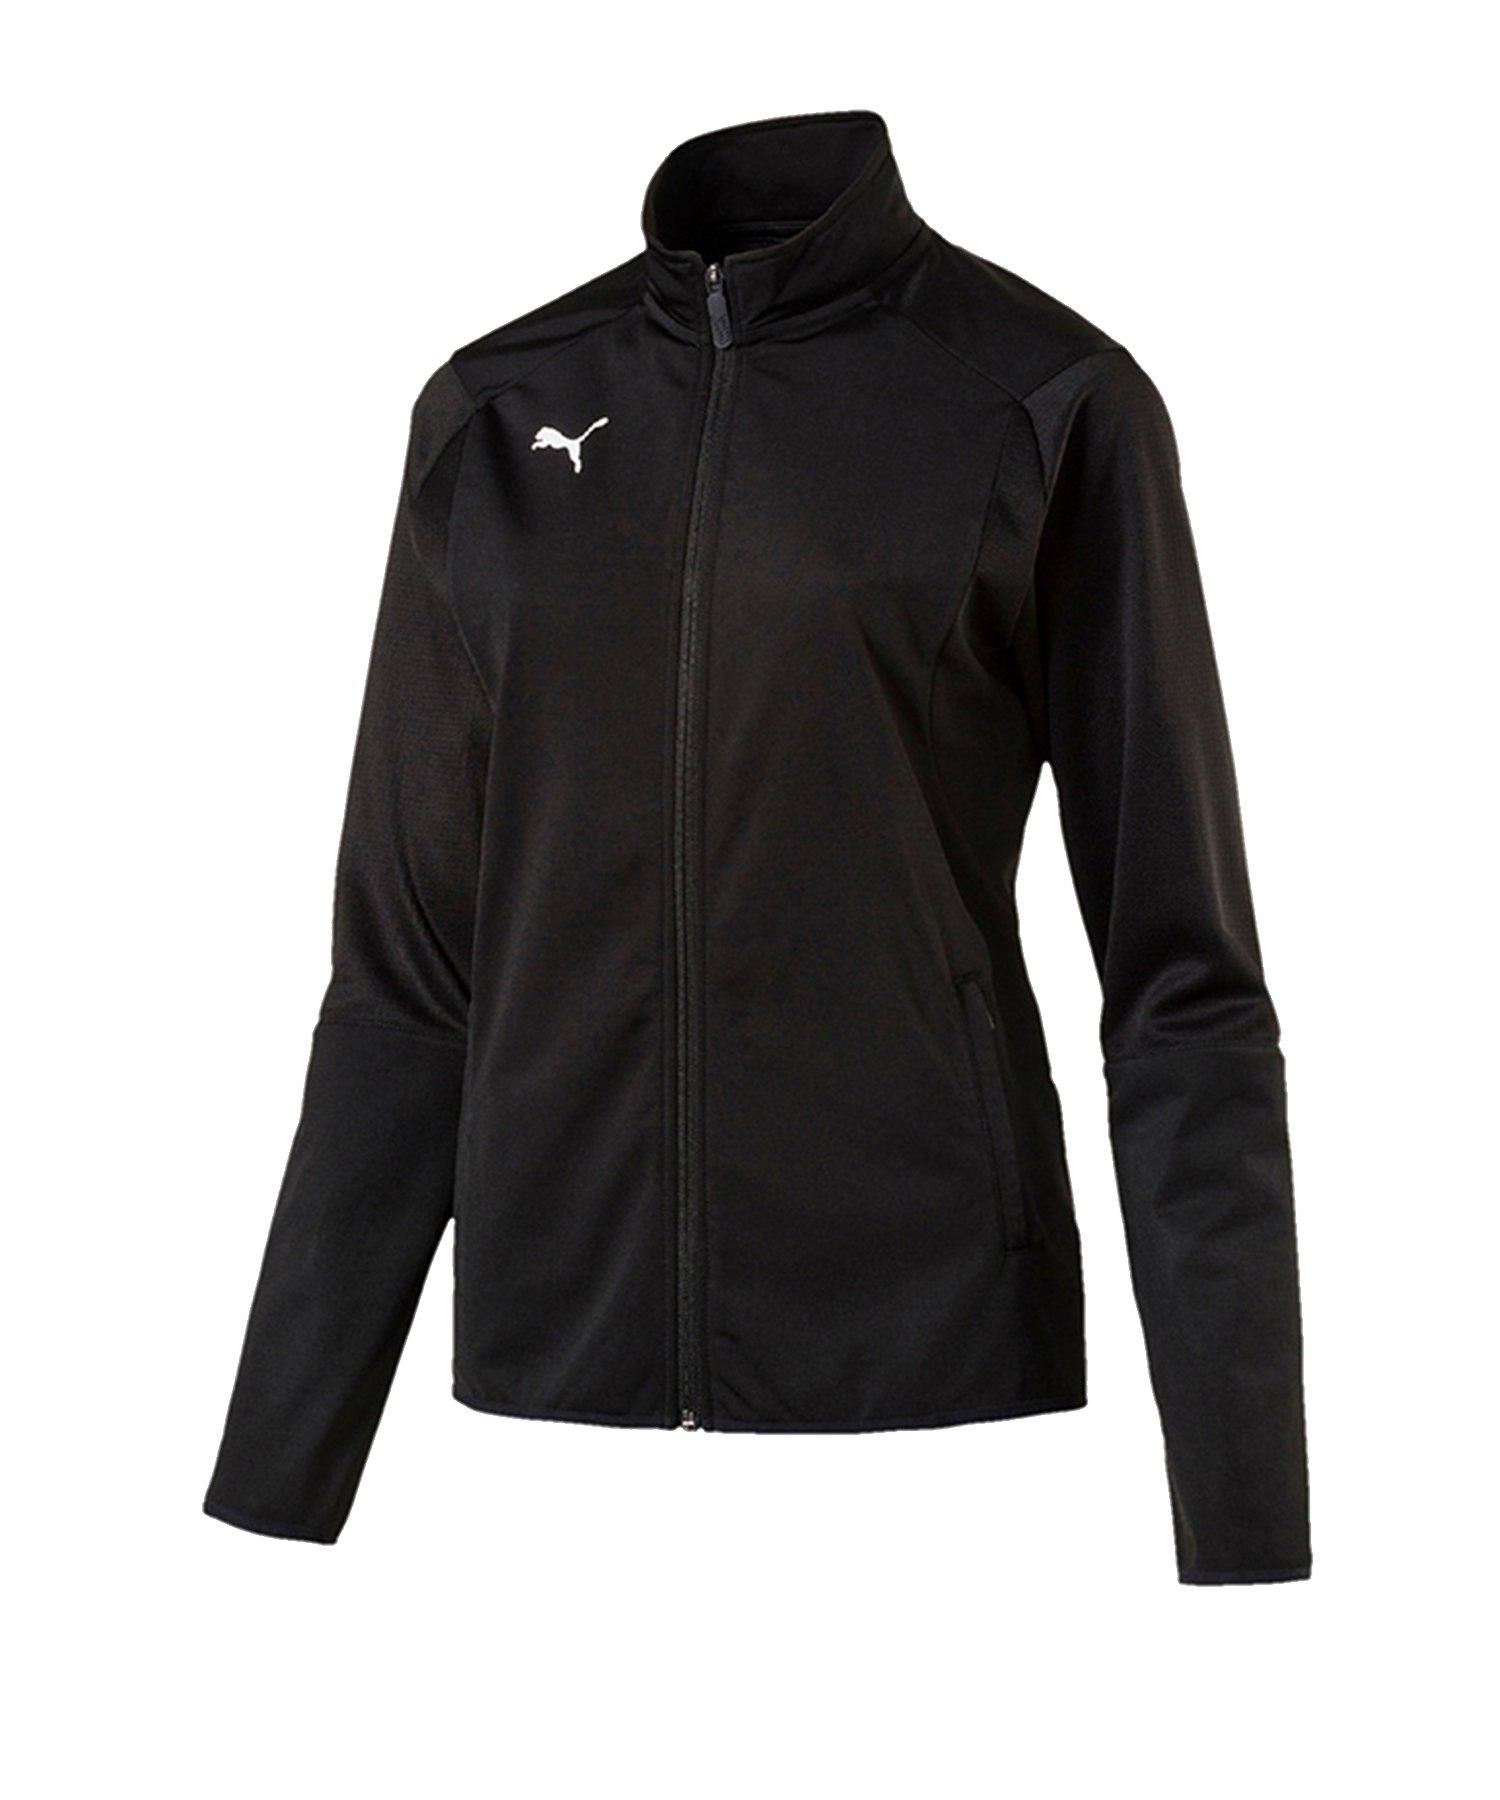 PUMA LIGA Trainingsjacke Damen Schwarz F03